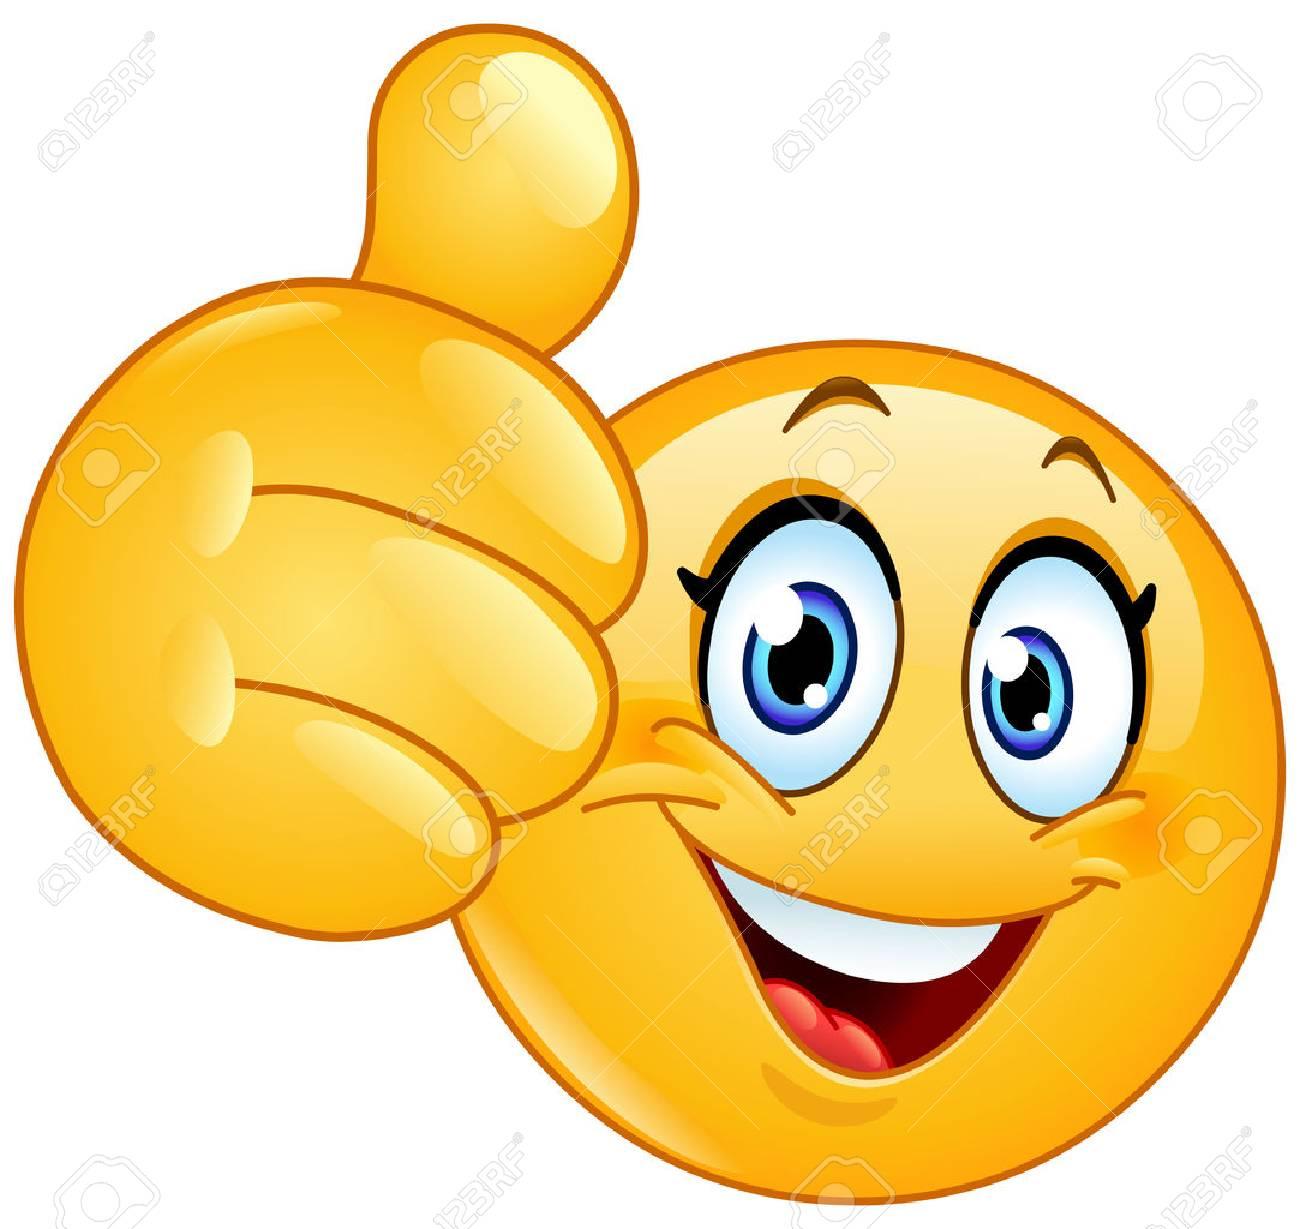 emoji holding thumbs up